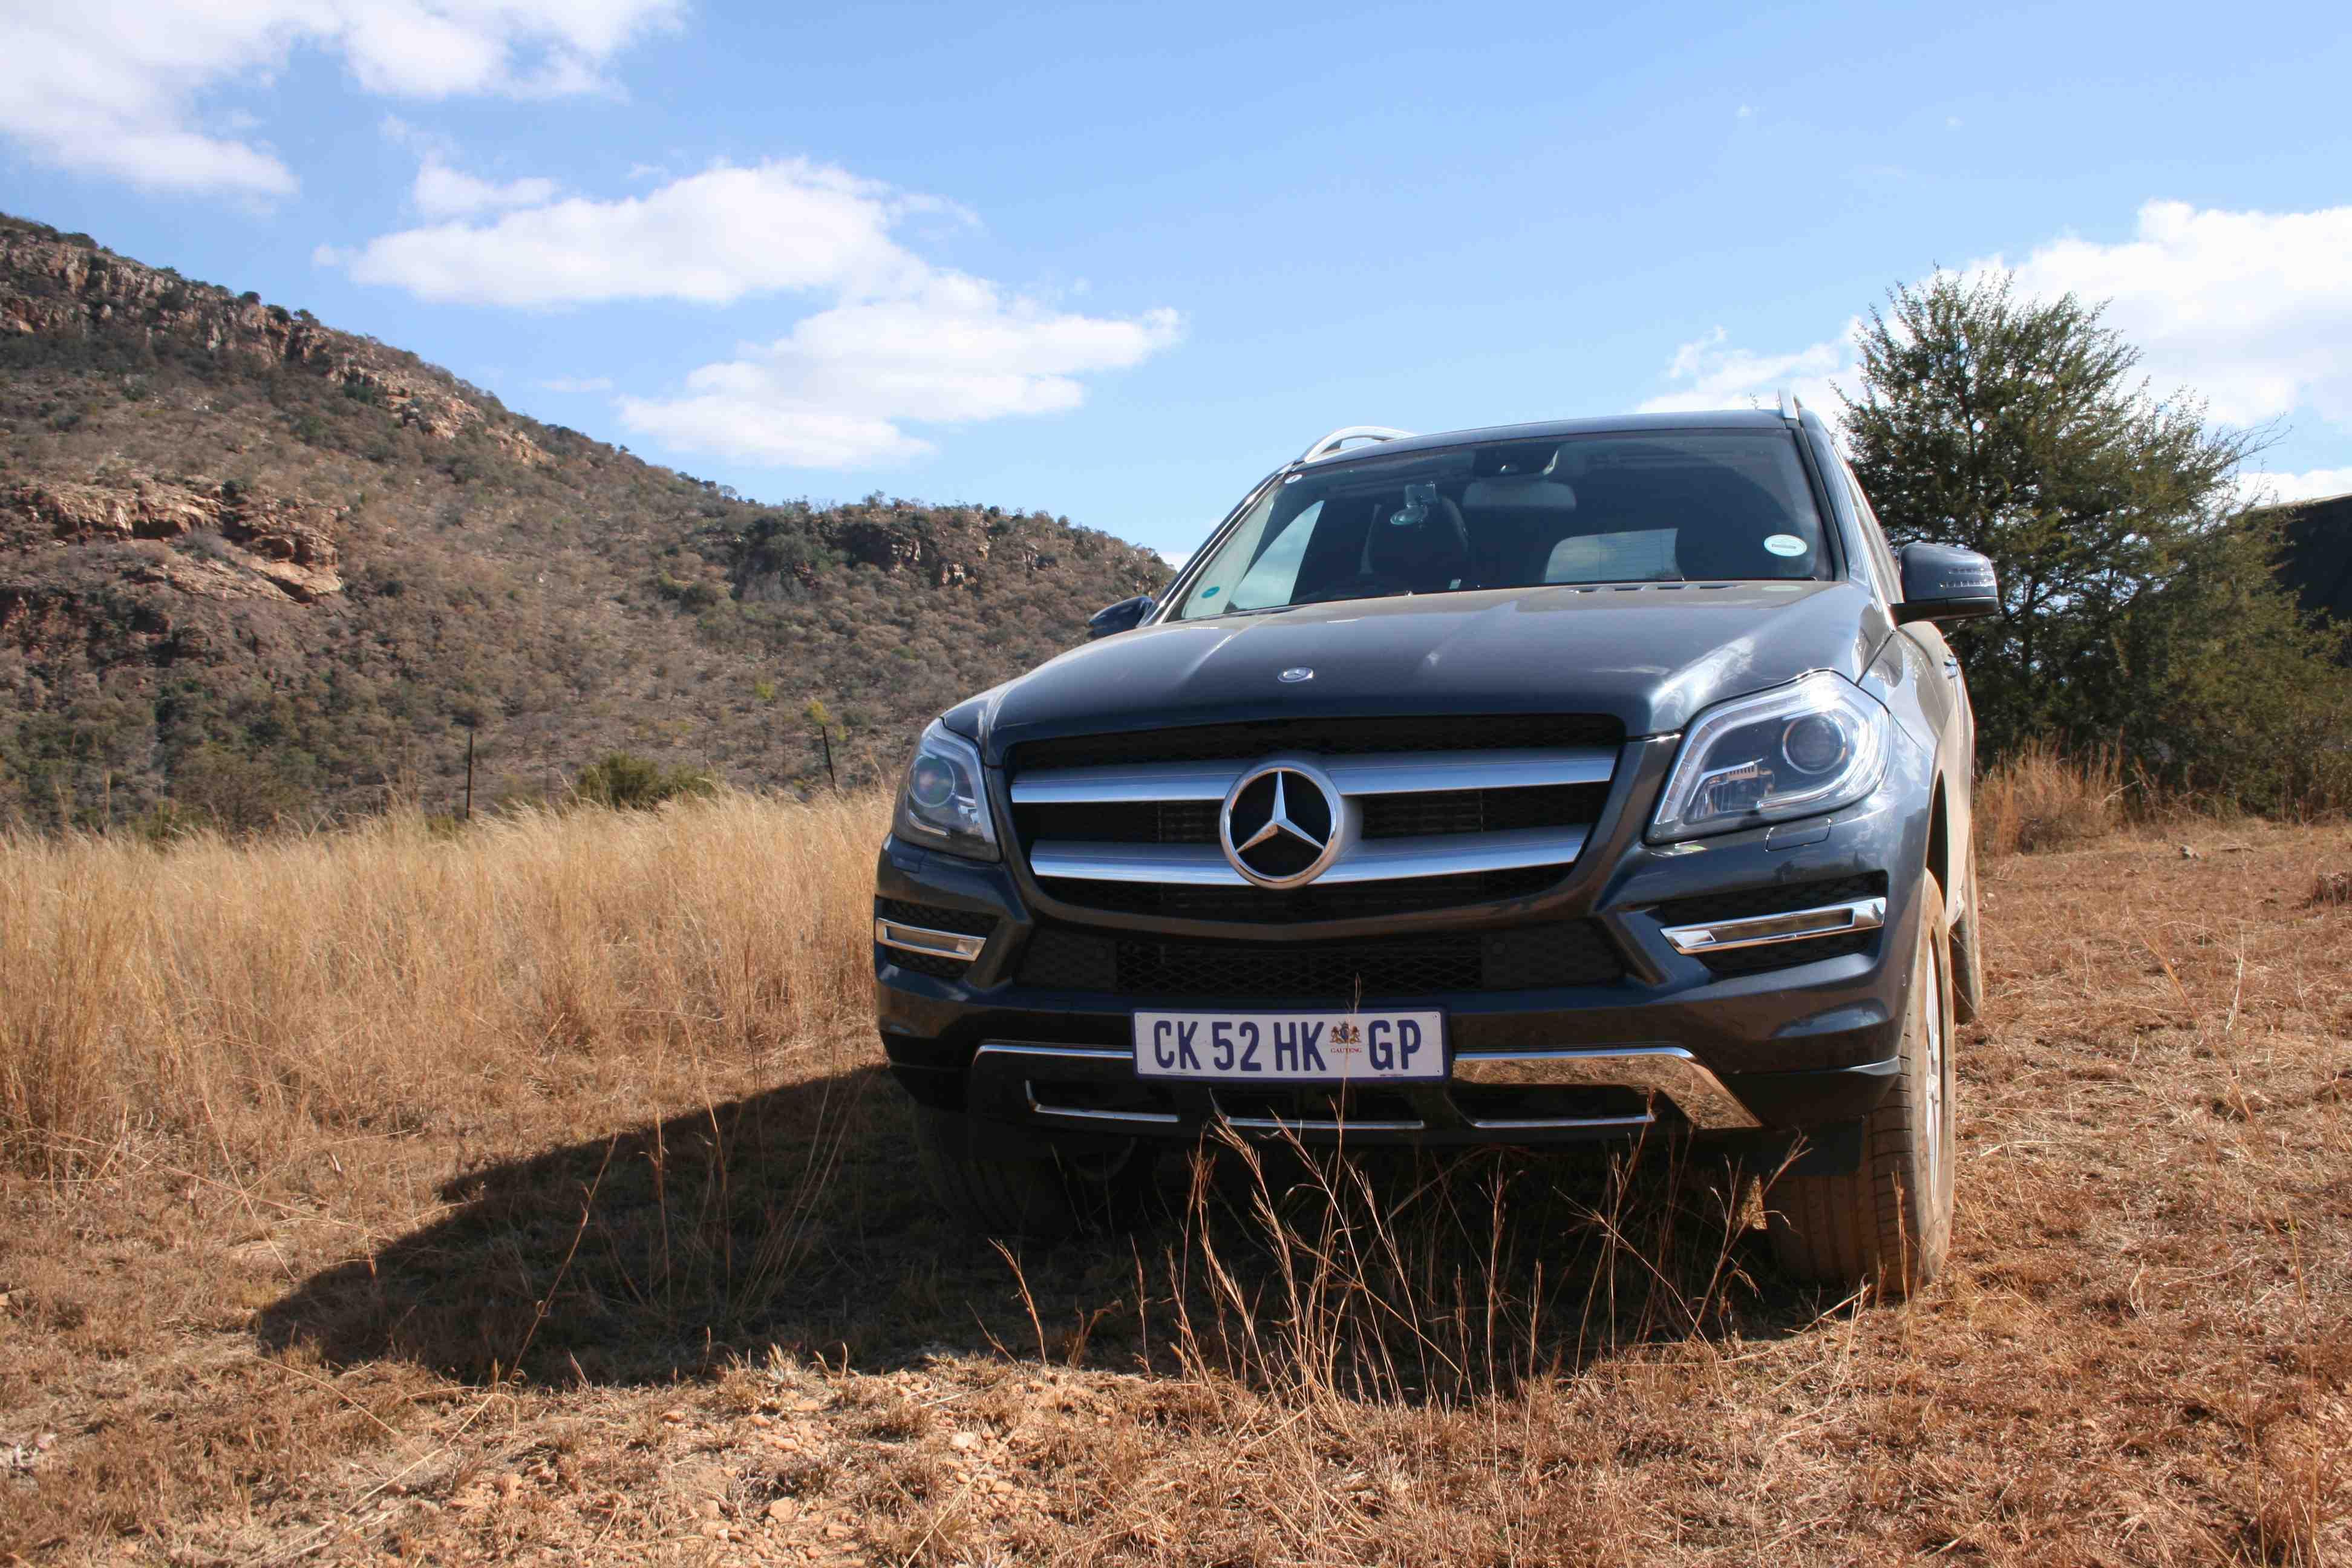 Review: 2013 Mercedes-Benz GL 350 CDI